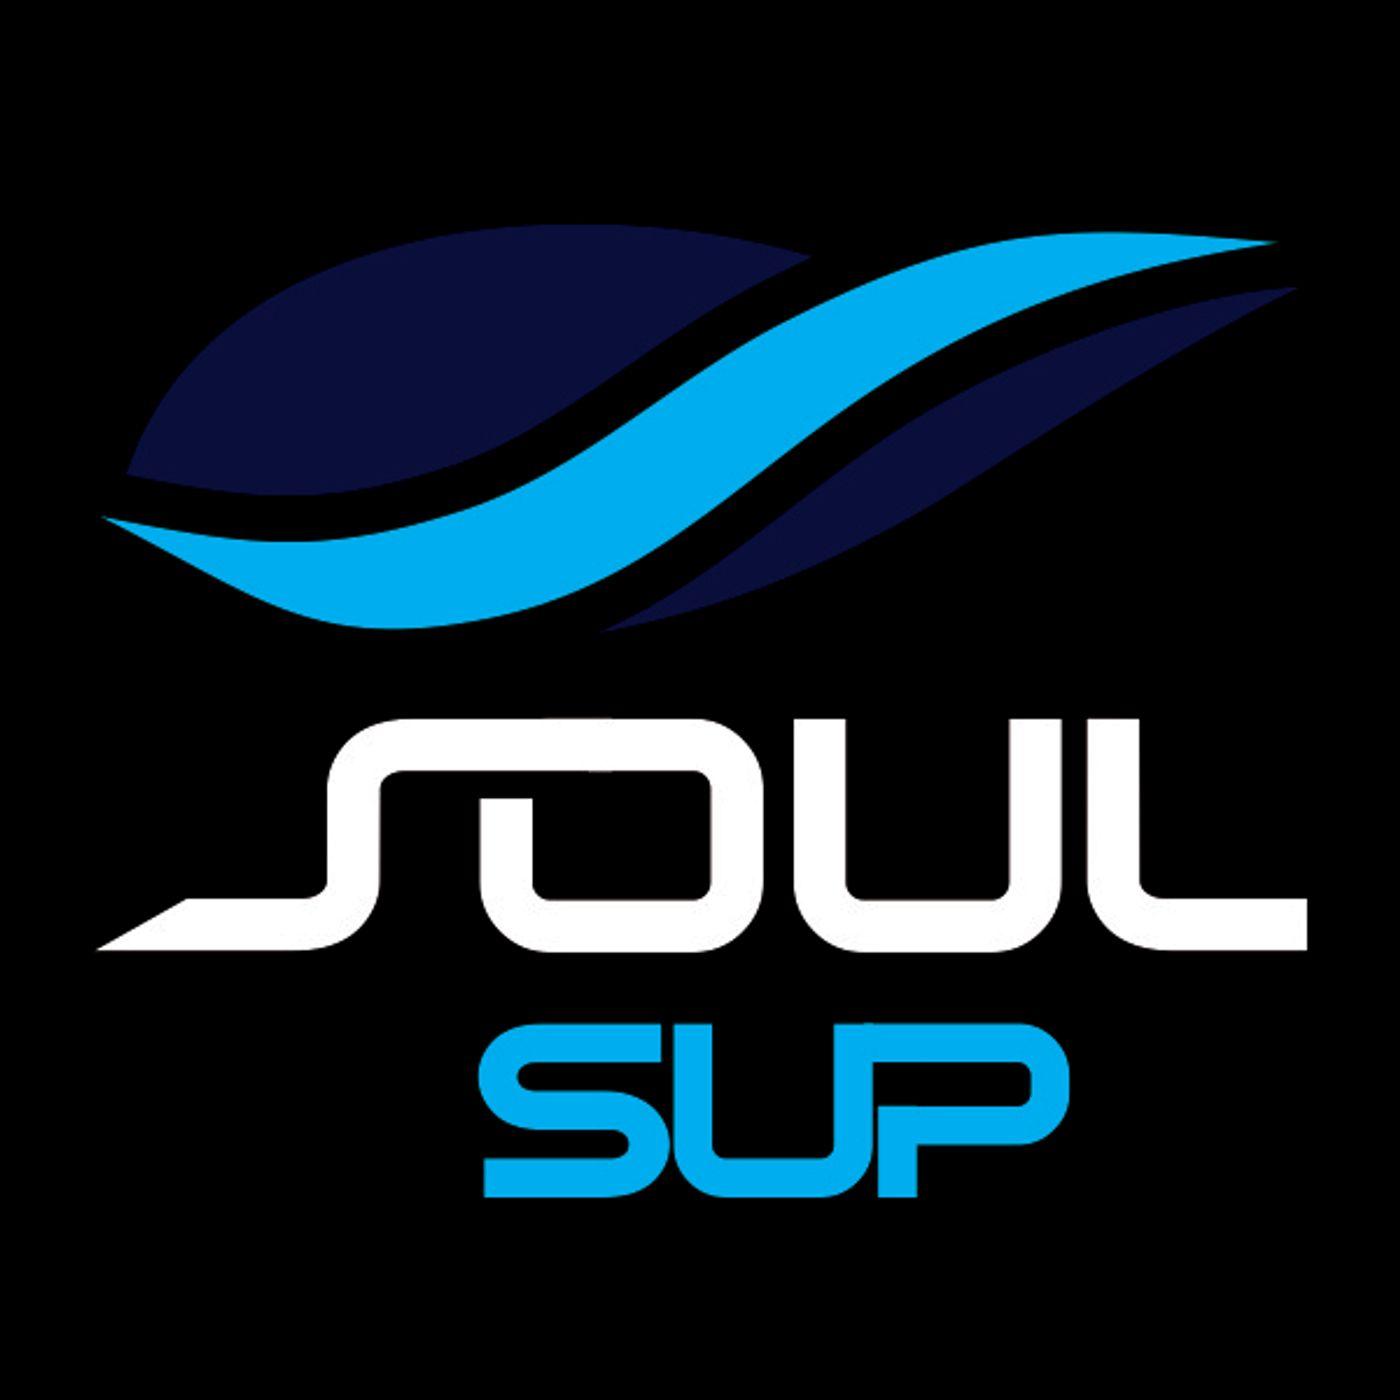 Soul SUP